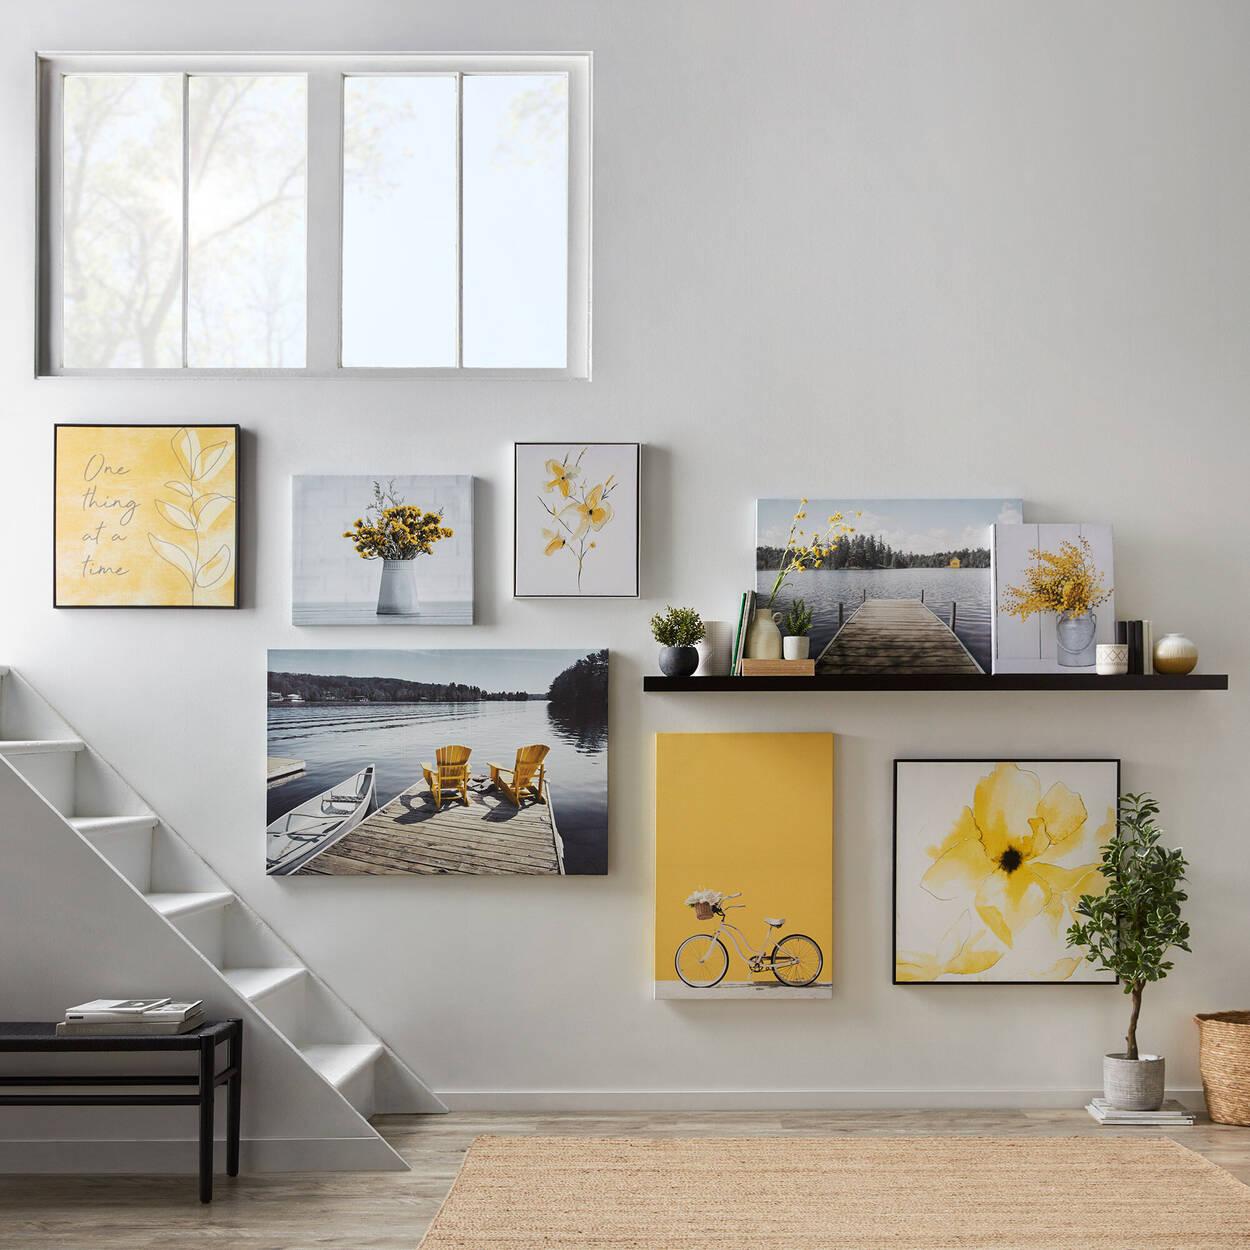 Tableau imprimé chaises Adirondack jaunes